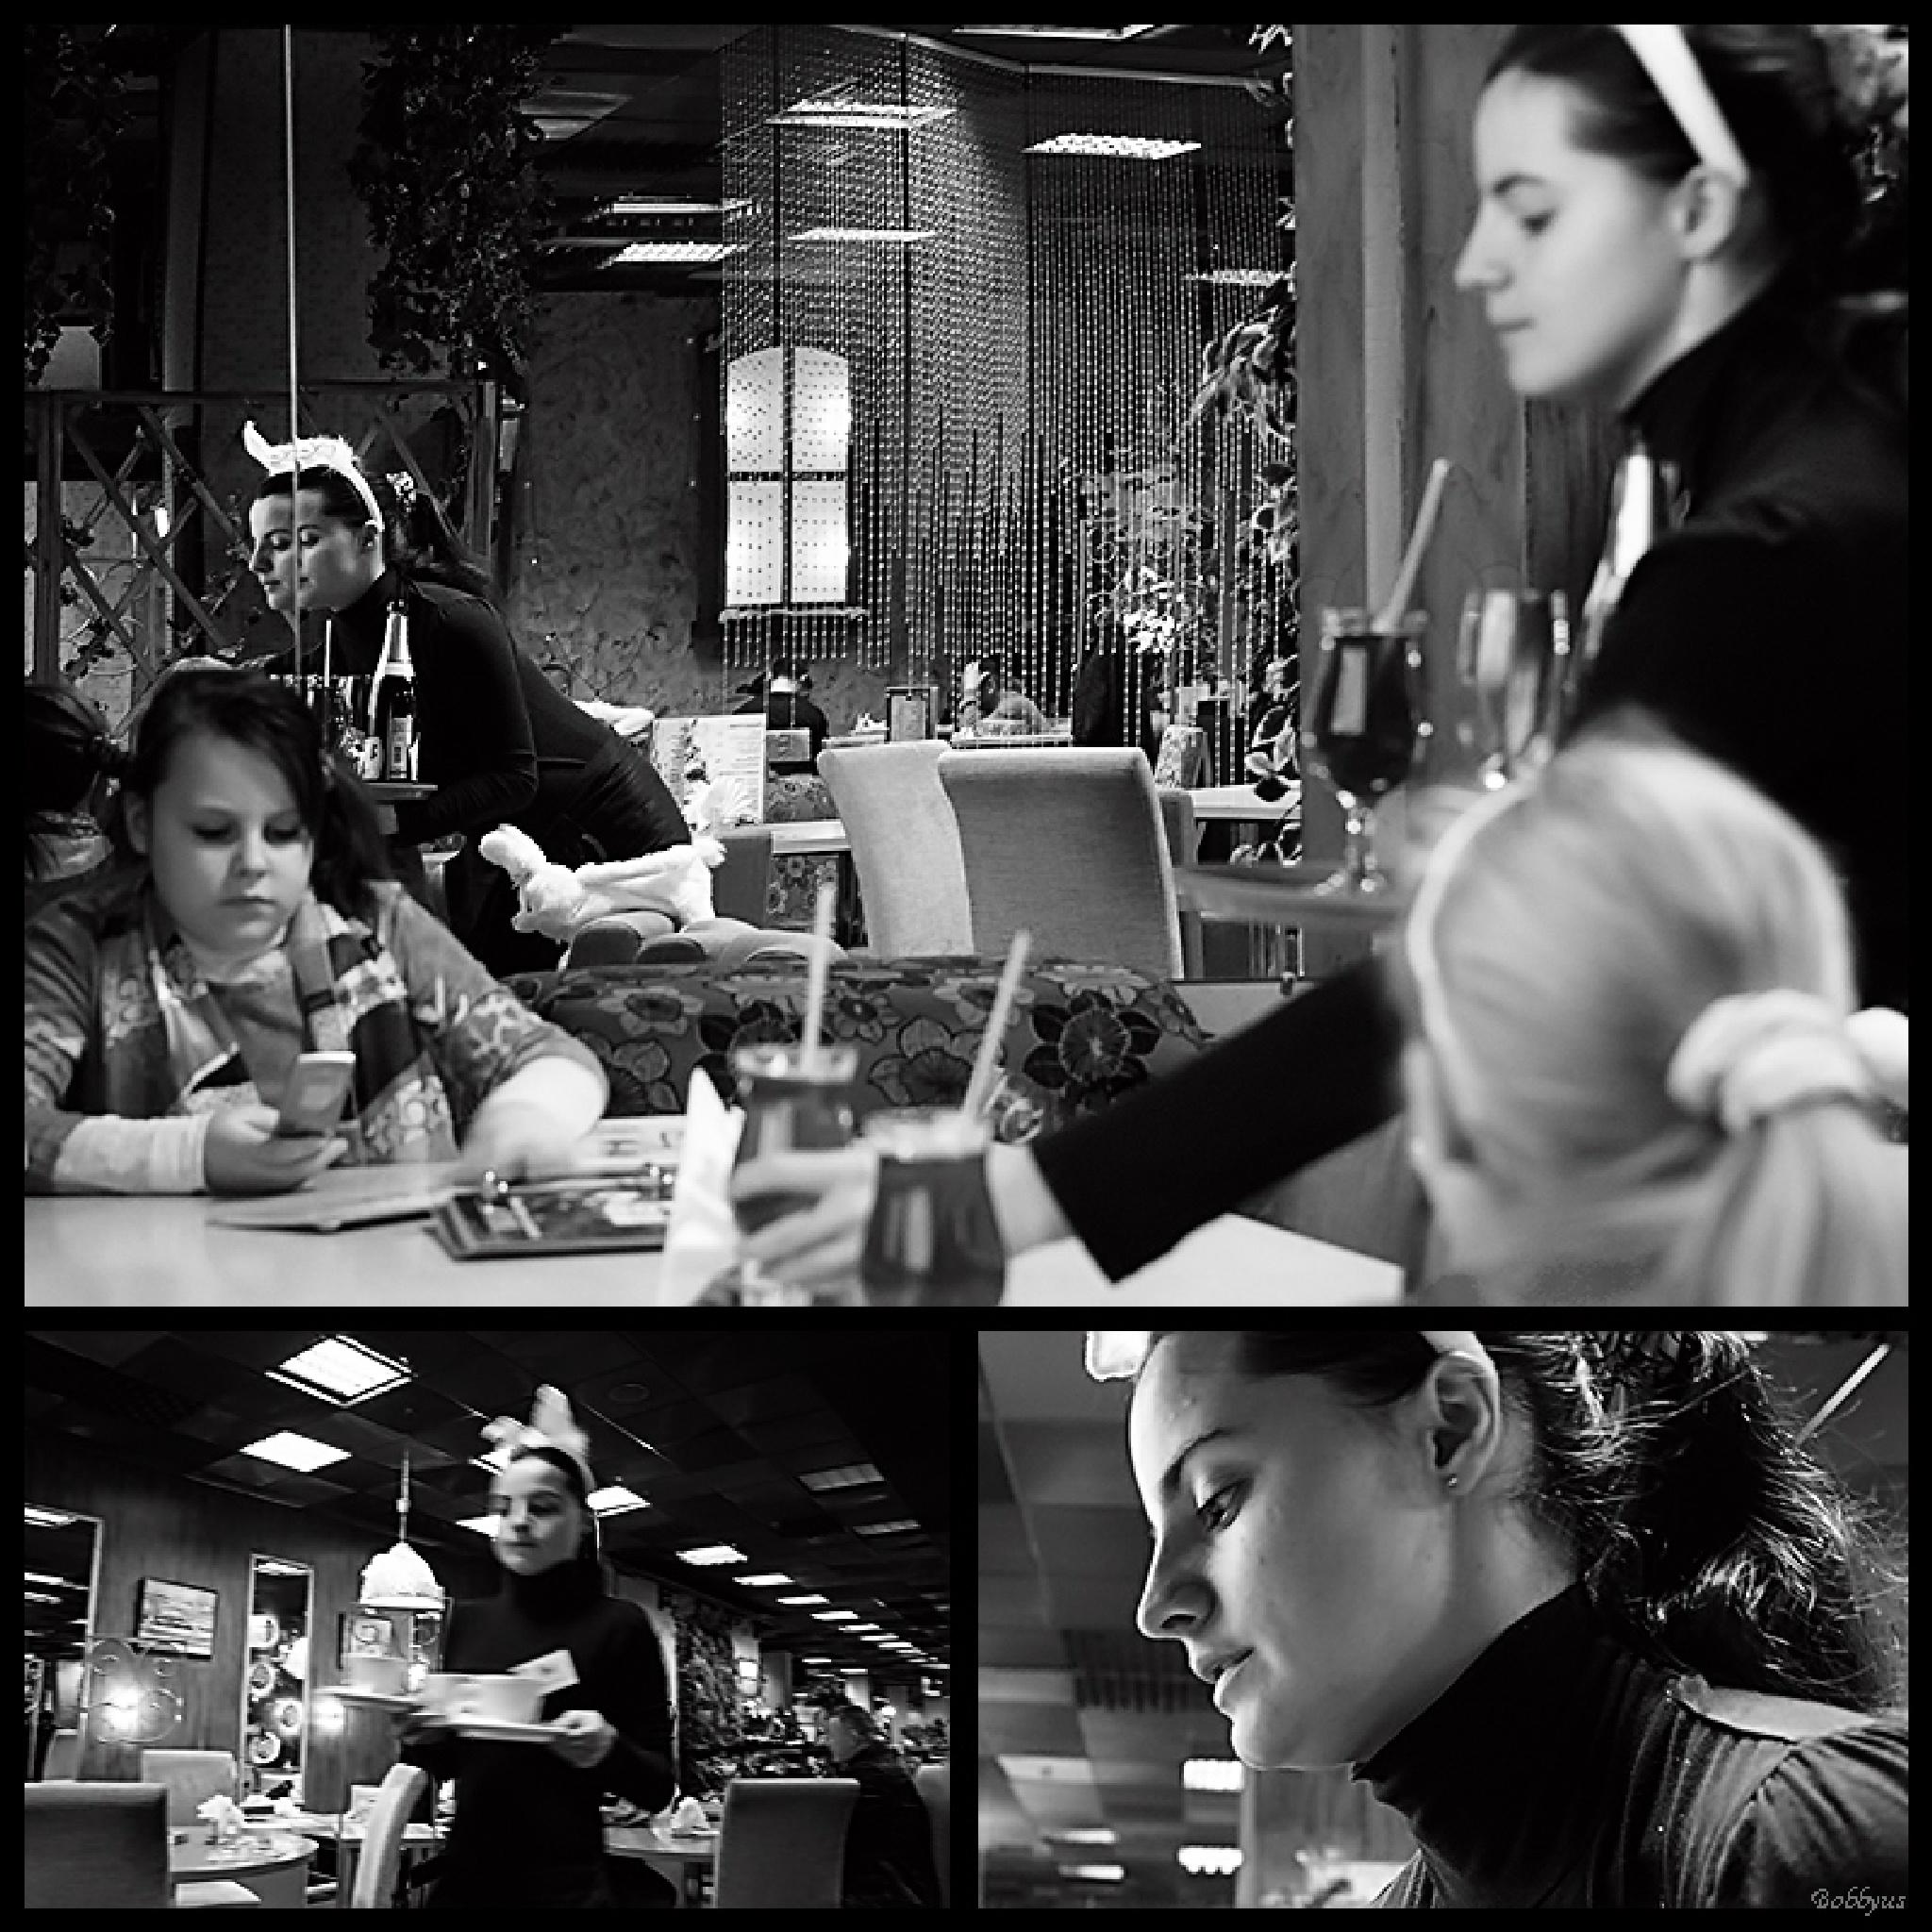 Waitress by Bobbyus